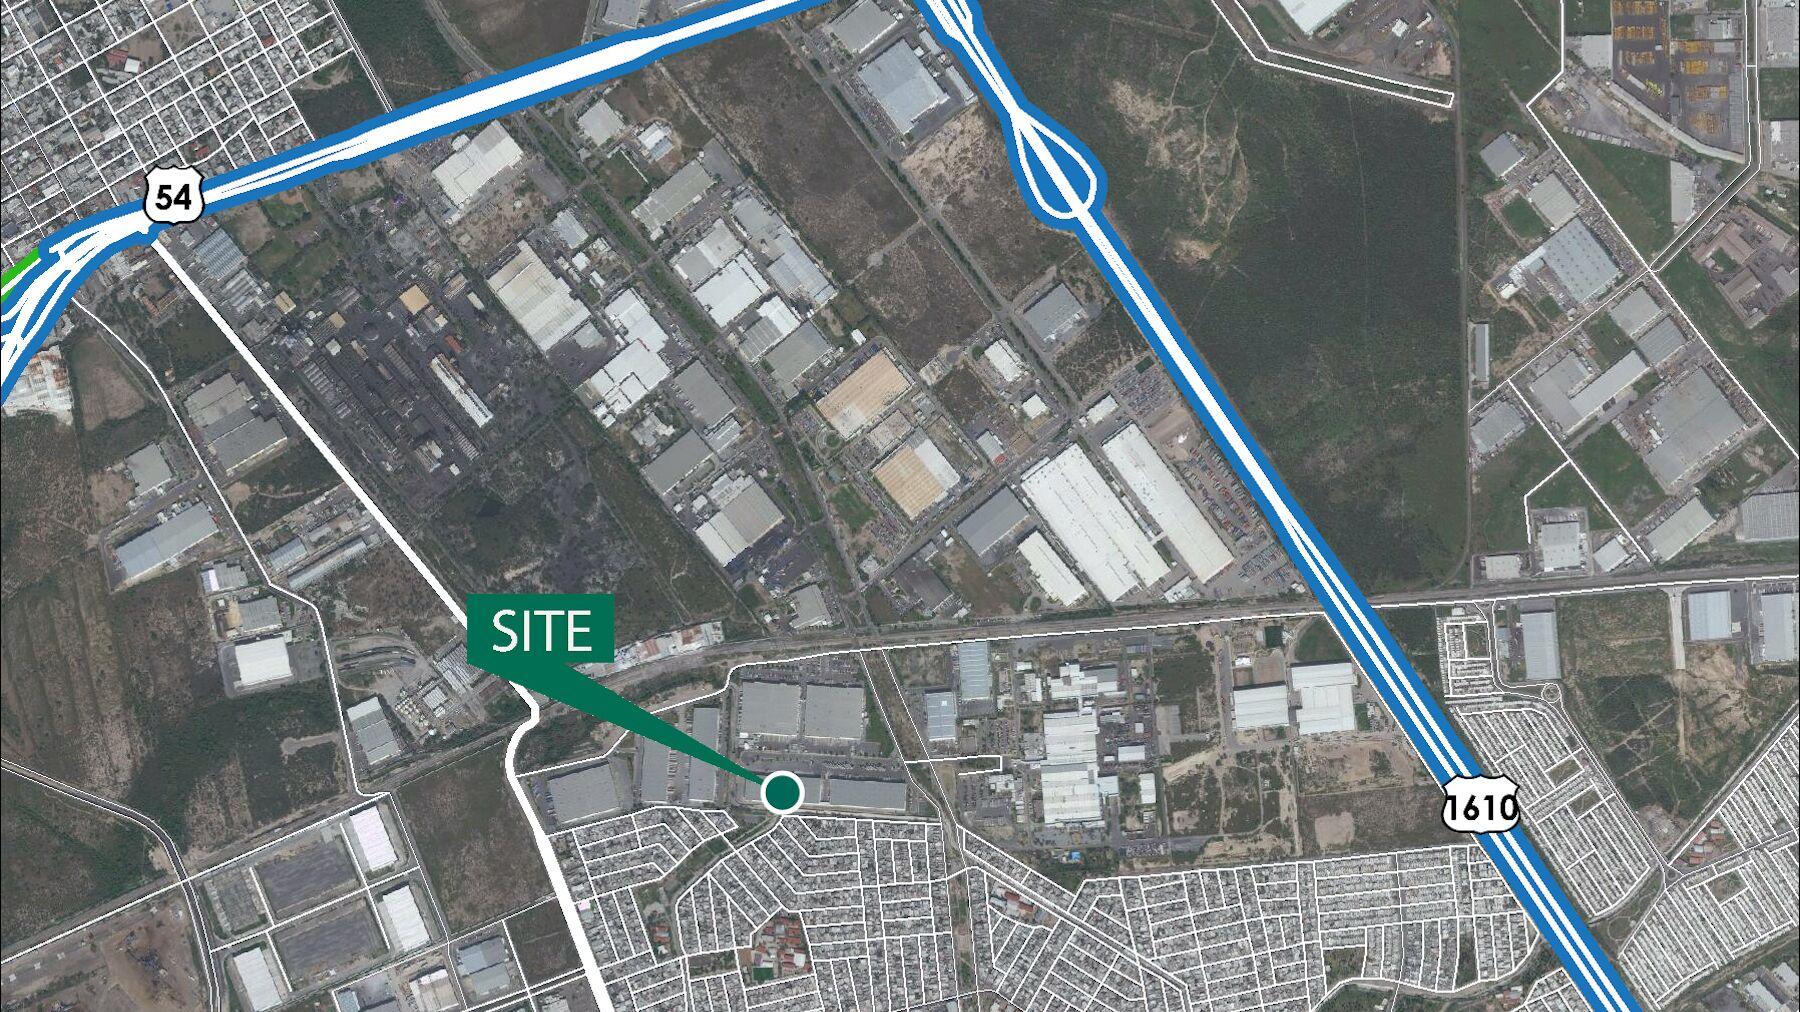 DPM-MIC-11-Flyer-Property-Aerial-3-25x4-49.jpg